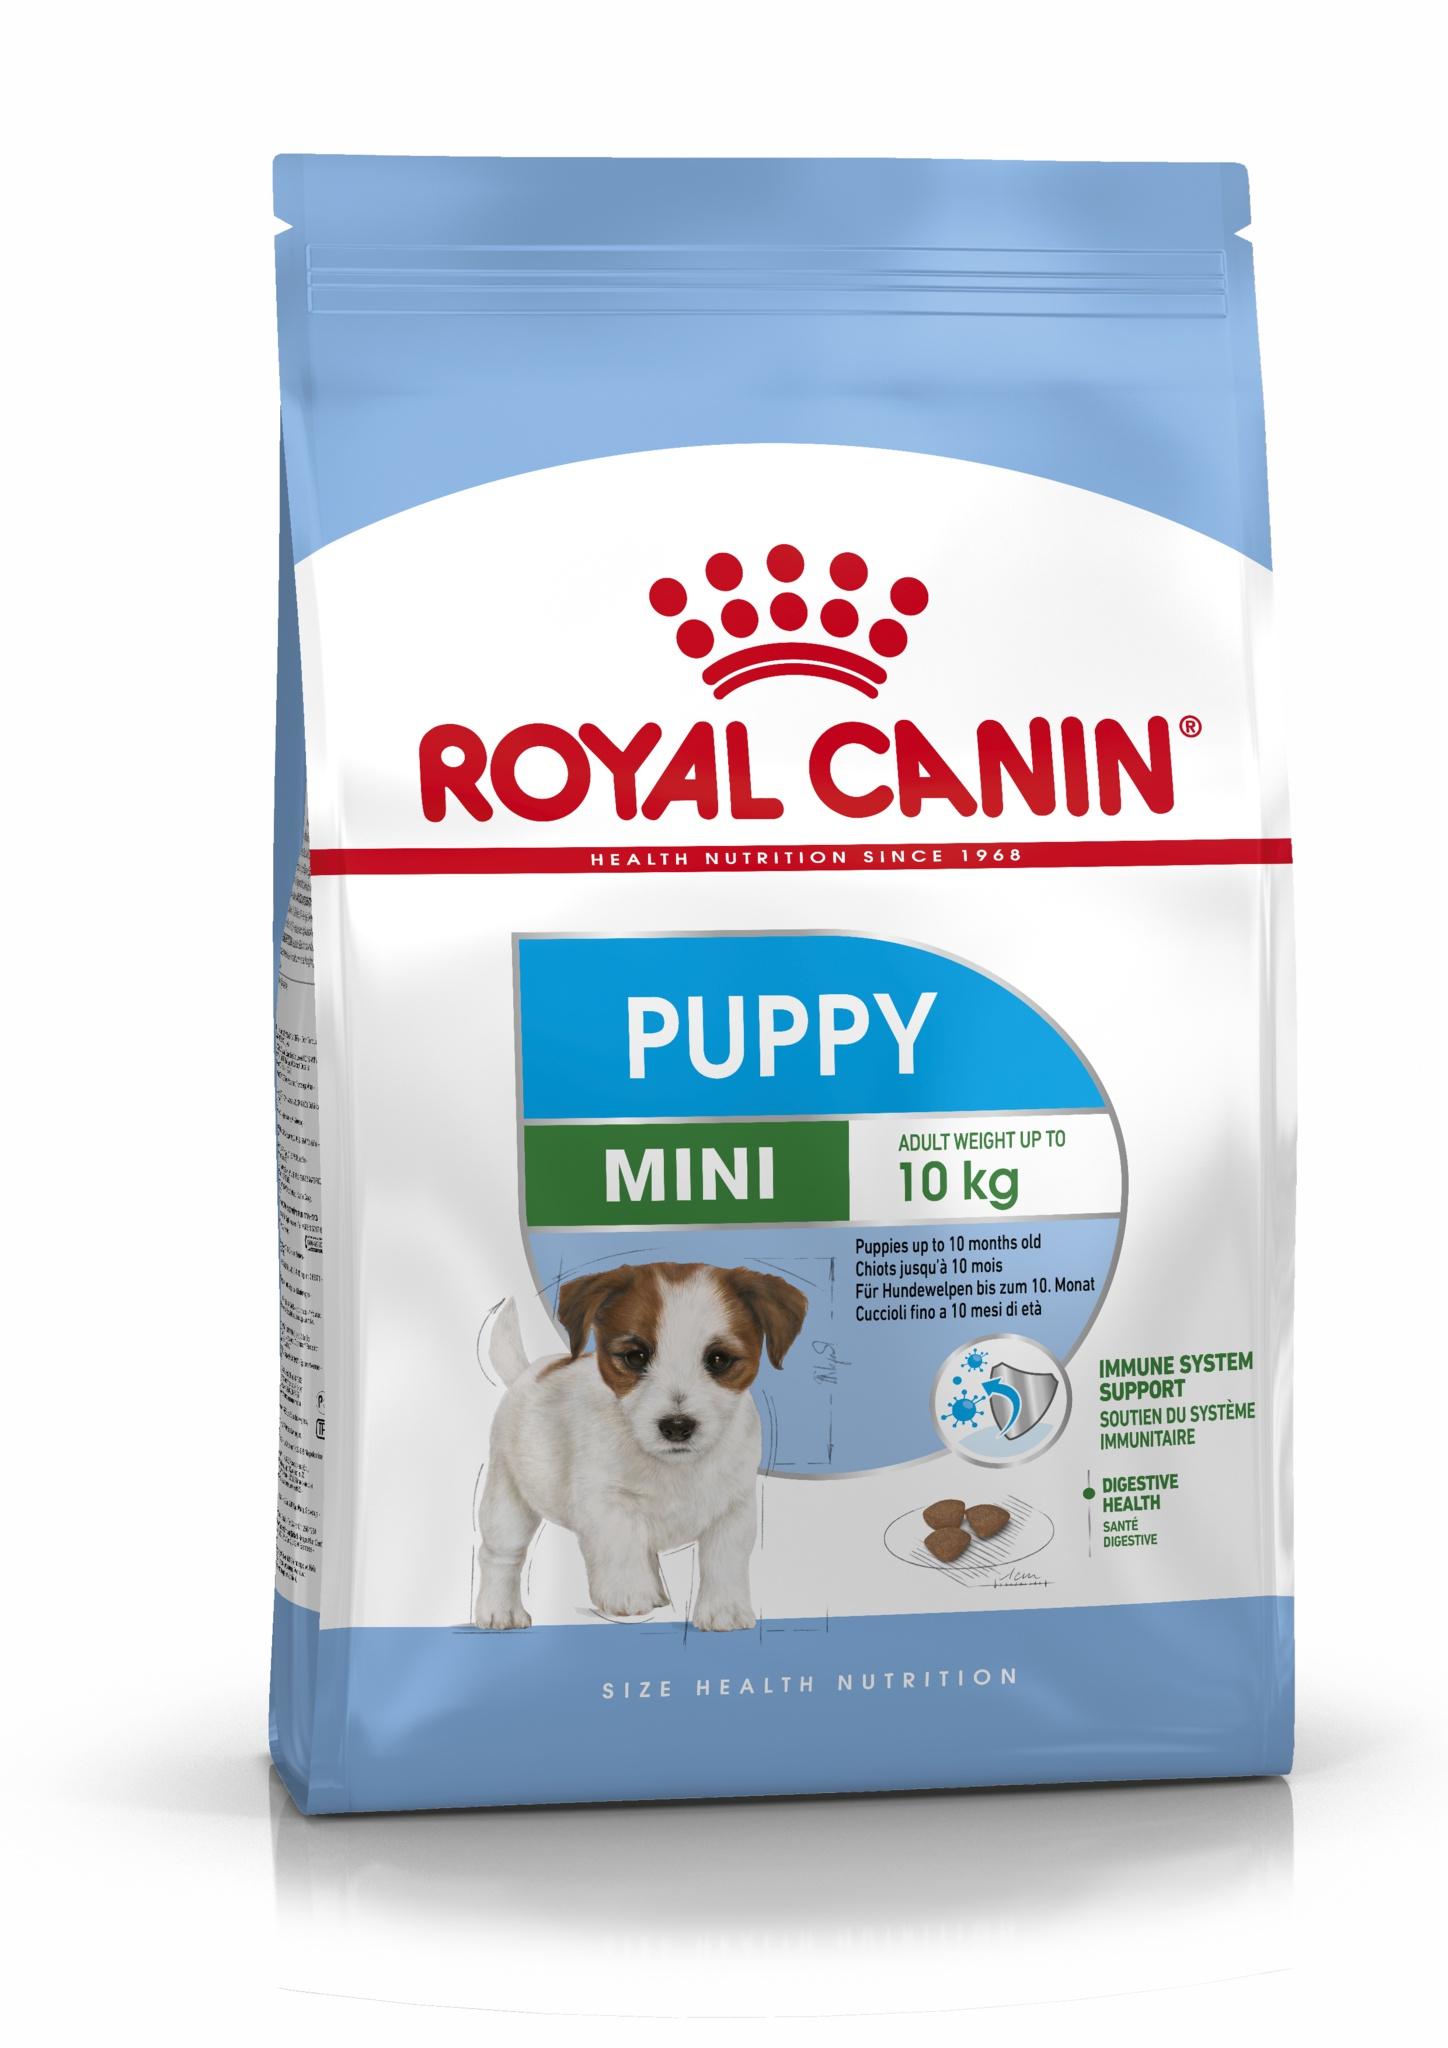 Royal Canin корм для щенков миниатюрных пород (3 кг) royal canin корм для щенков крупных пород 3 кг